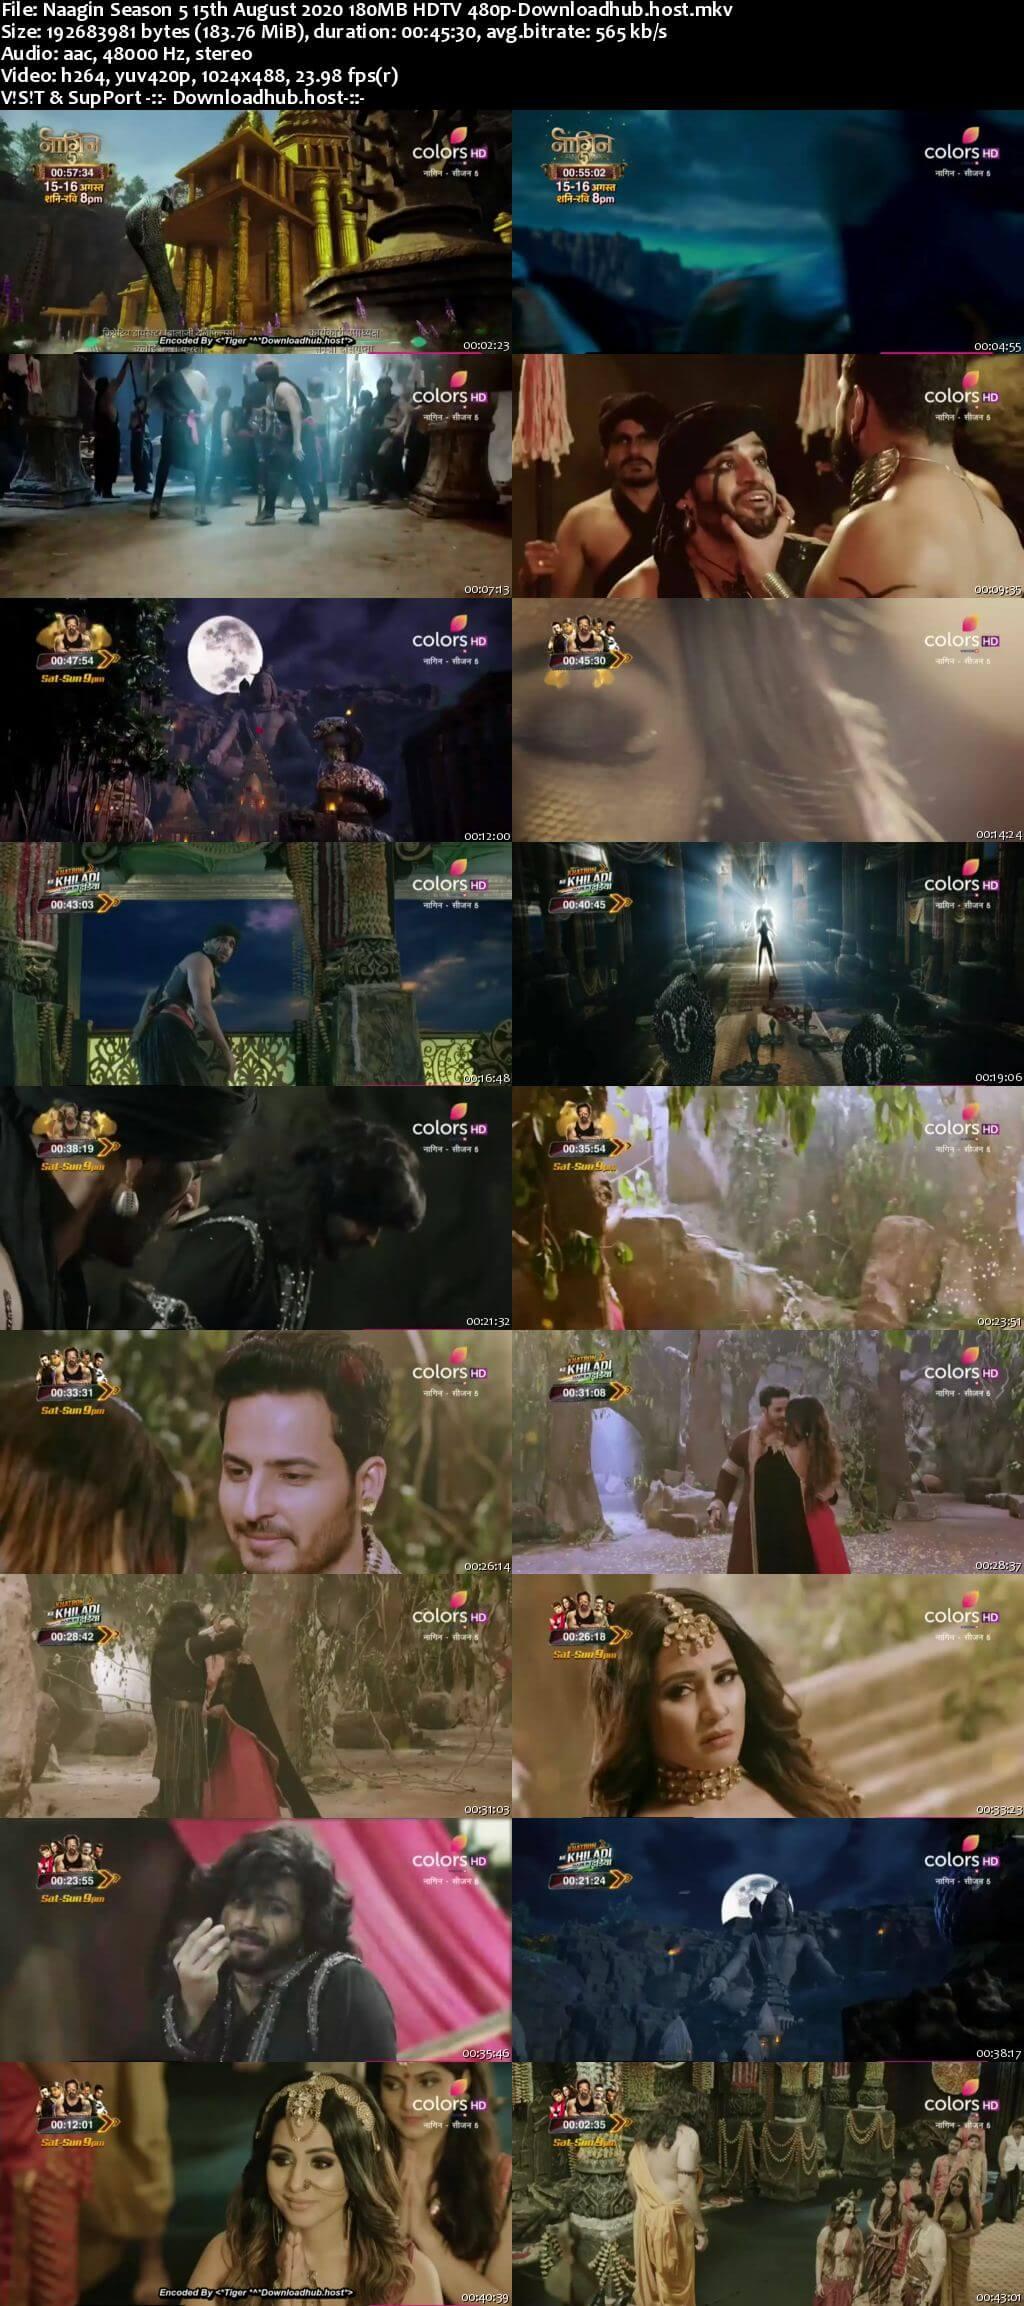 Naagin Season 5 15th August 2020 180MB HDTV 480p